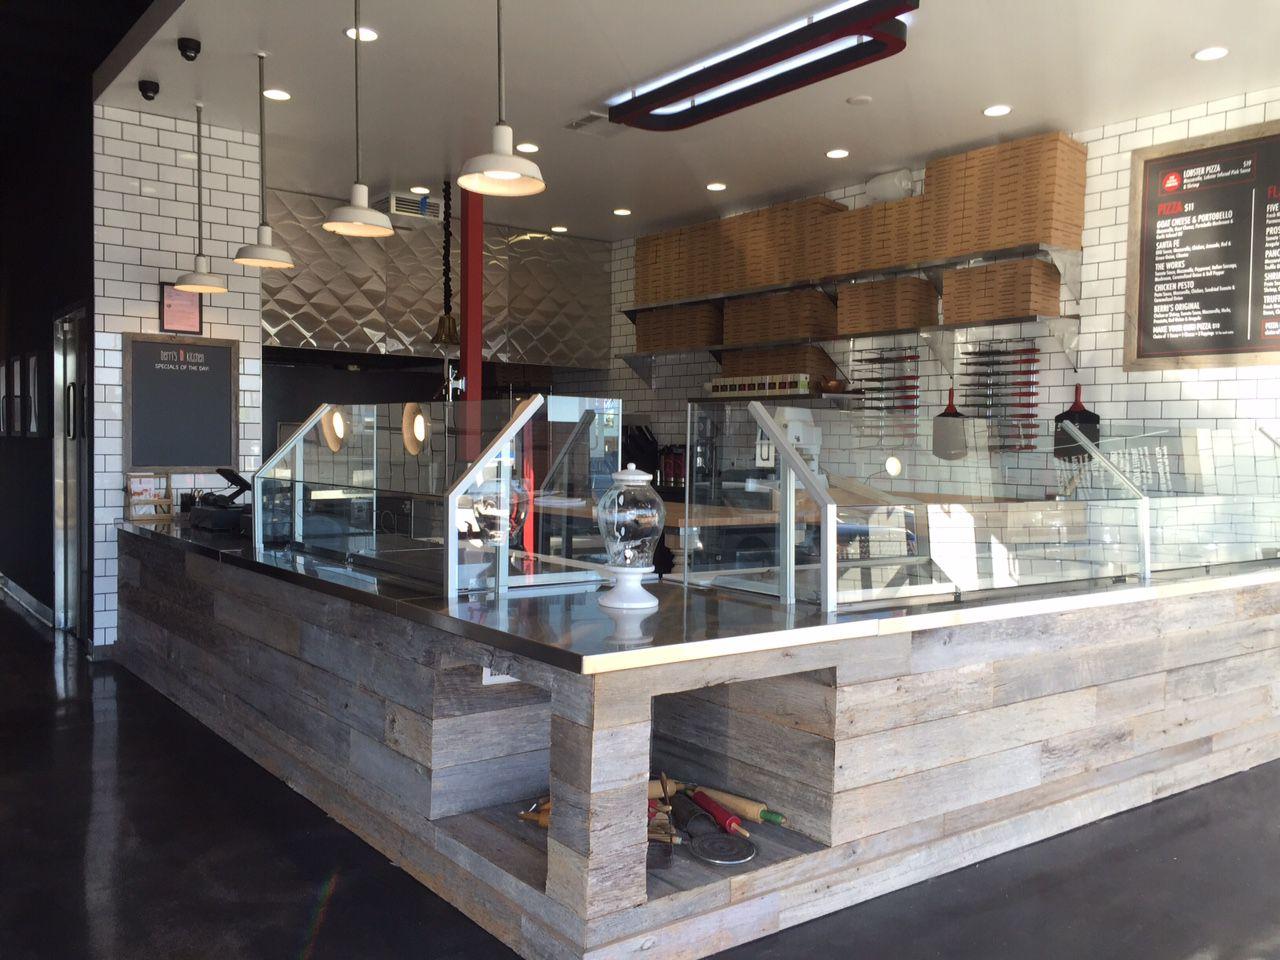 Berri S Kitchen Hollywood